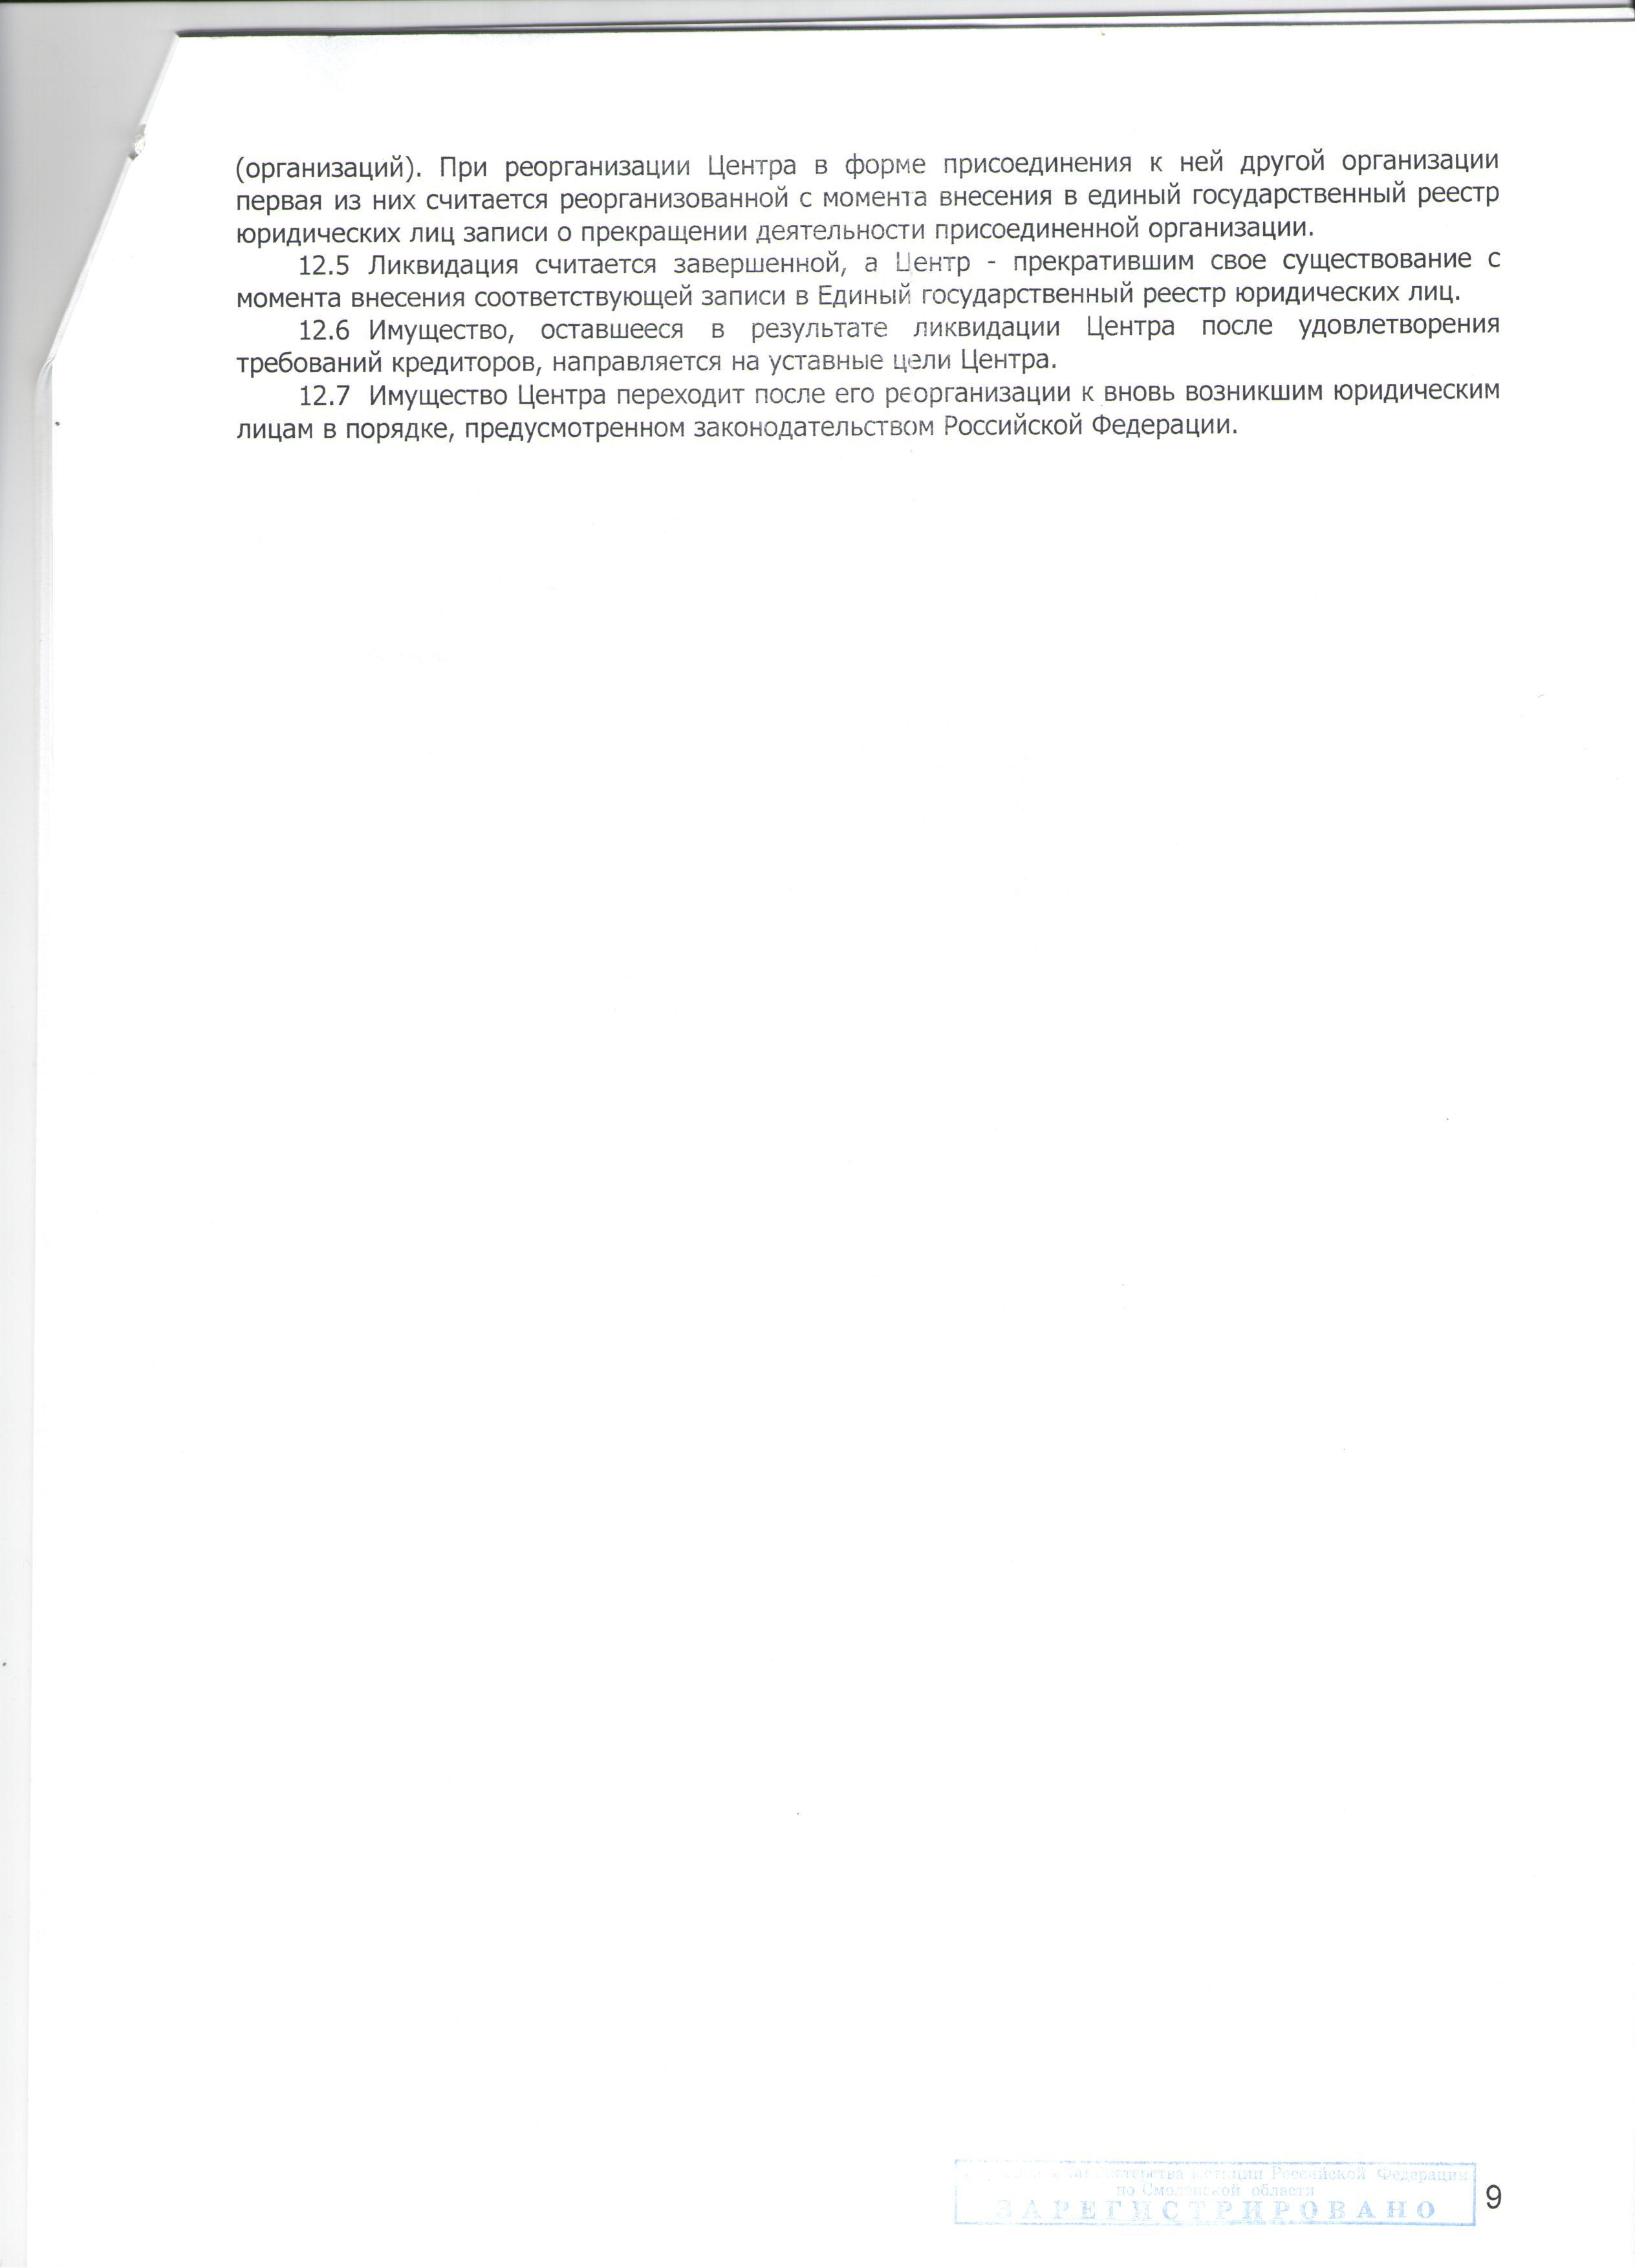 стр 9